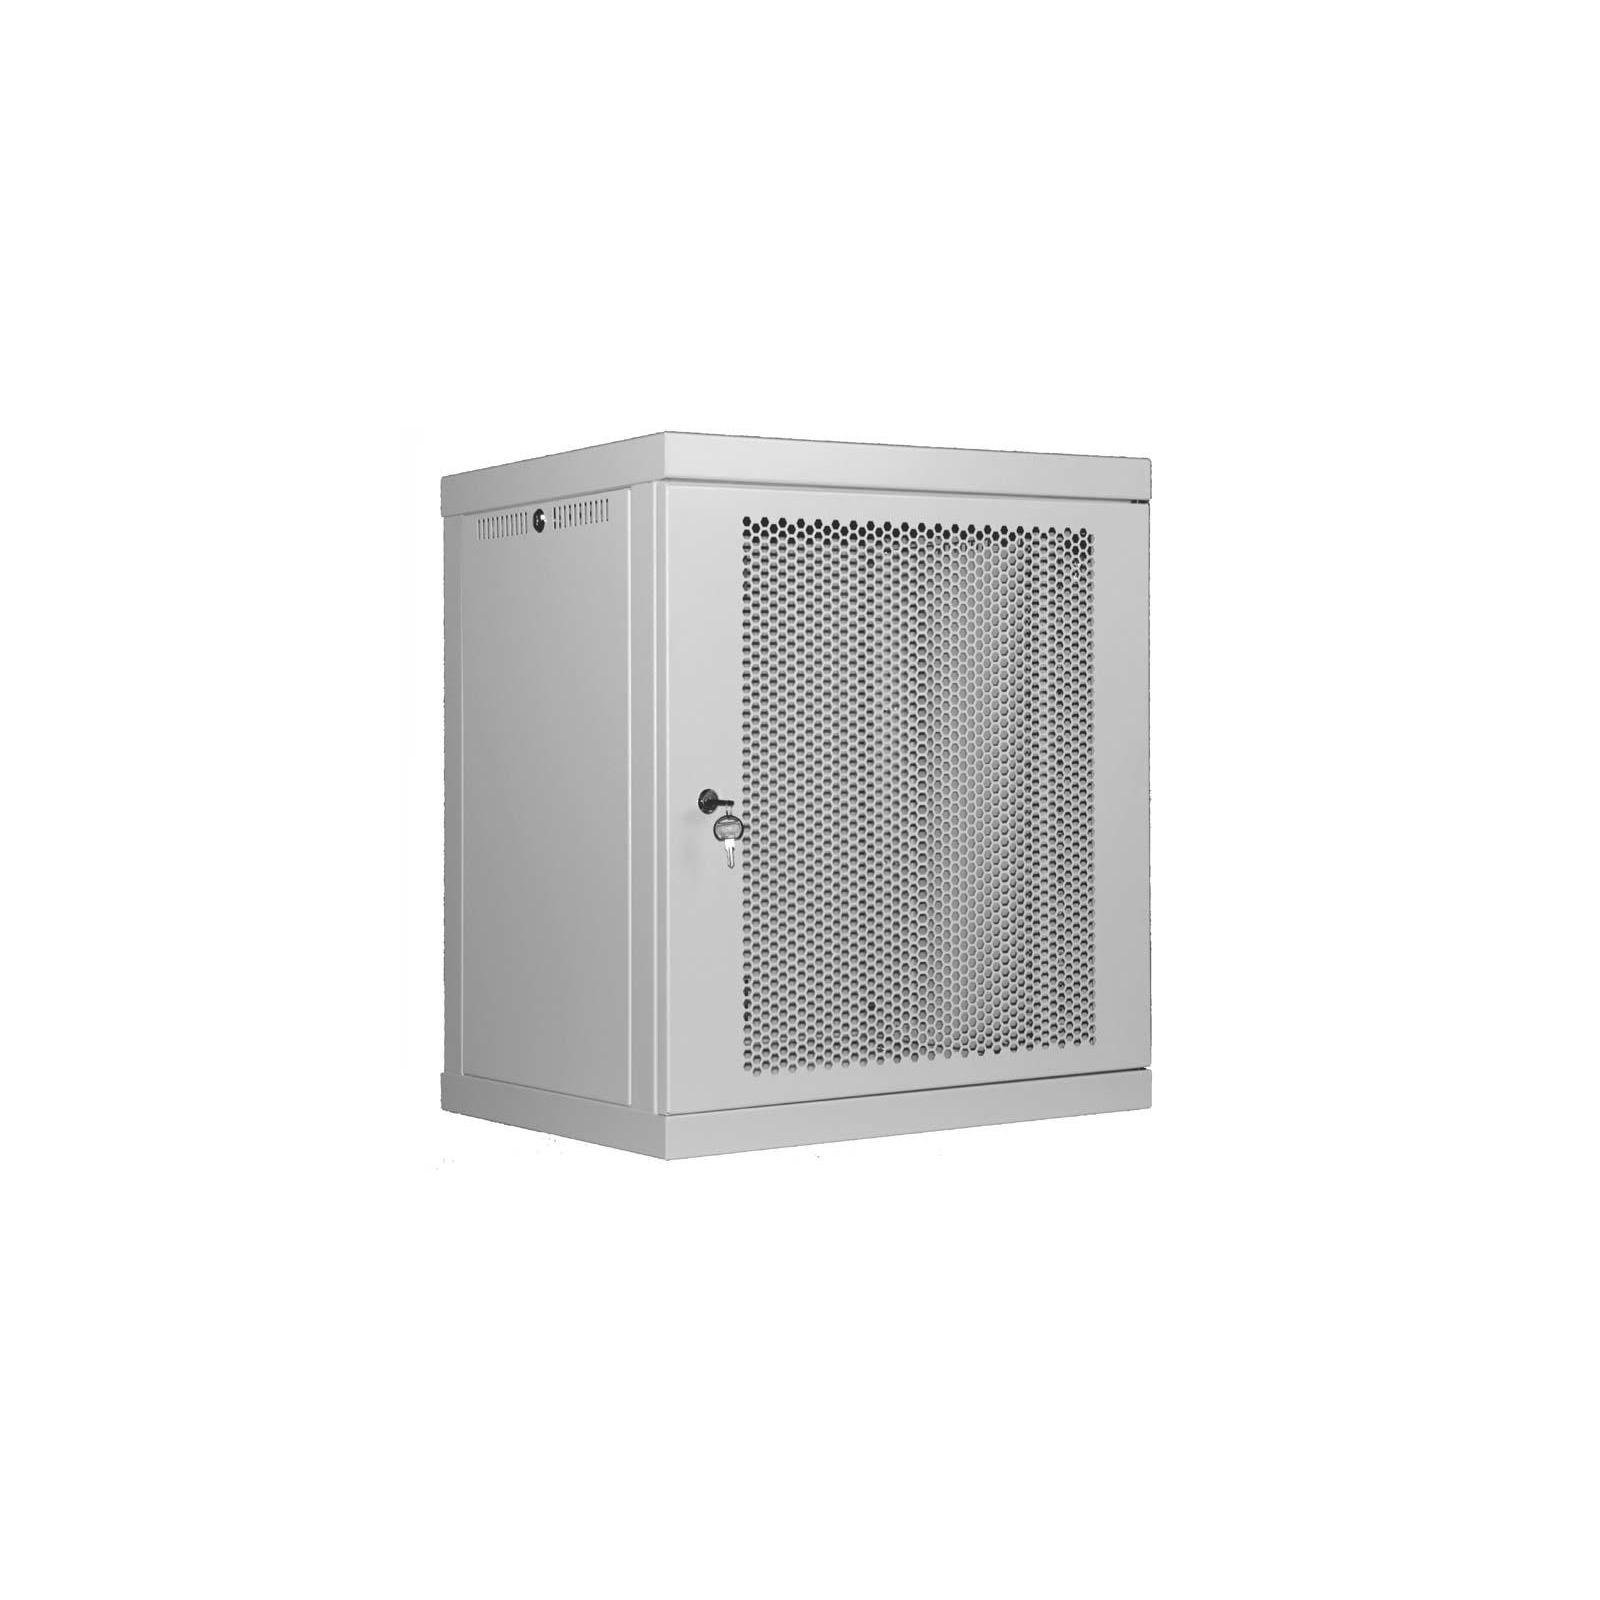 Шкаф настенный CSV 18U Wallmount Lite 580 Perf